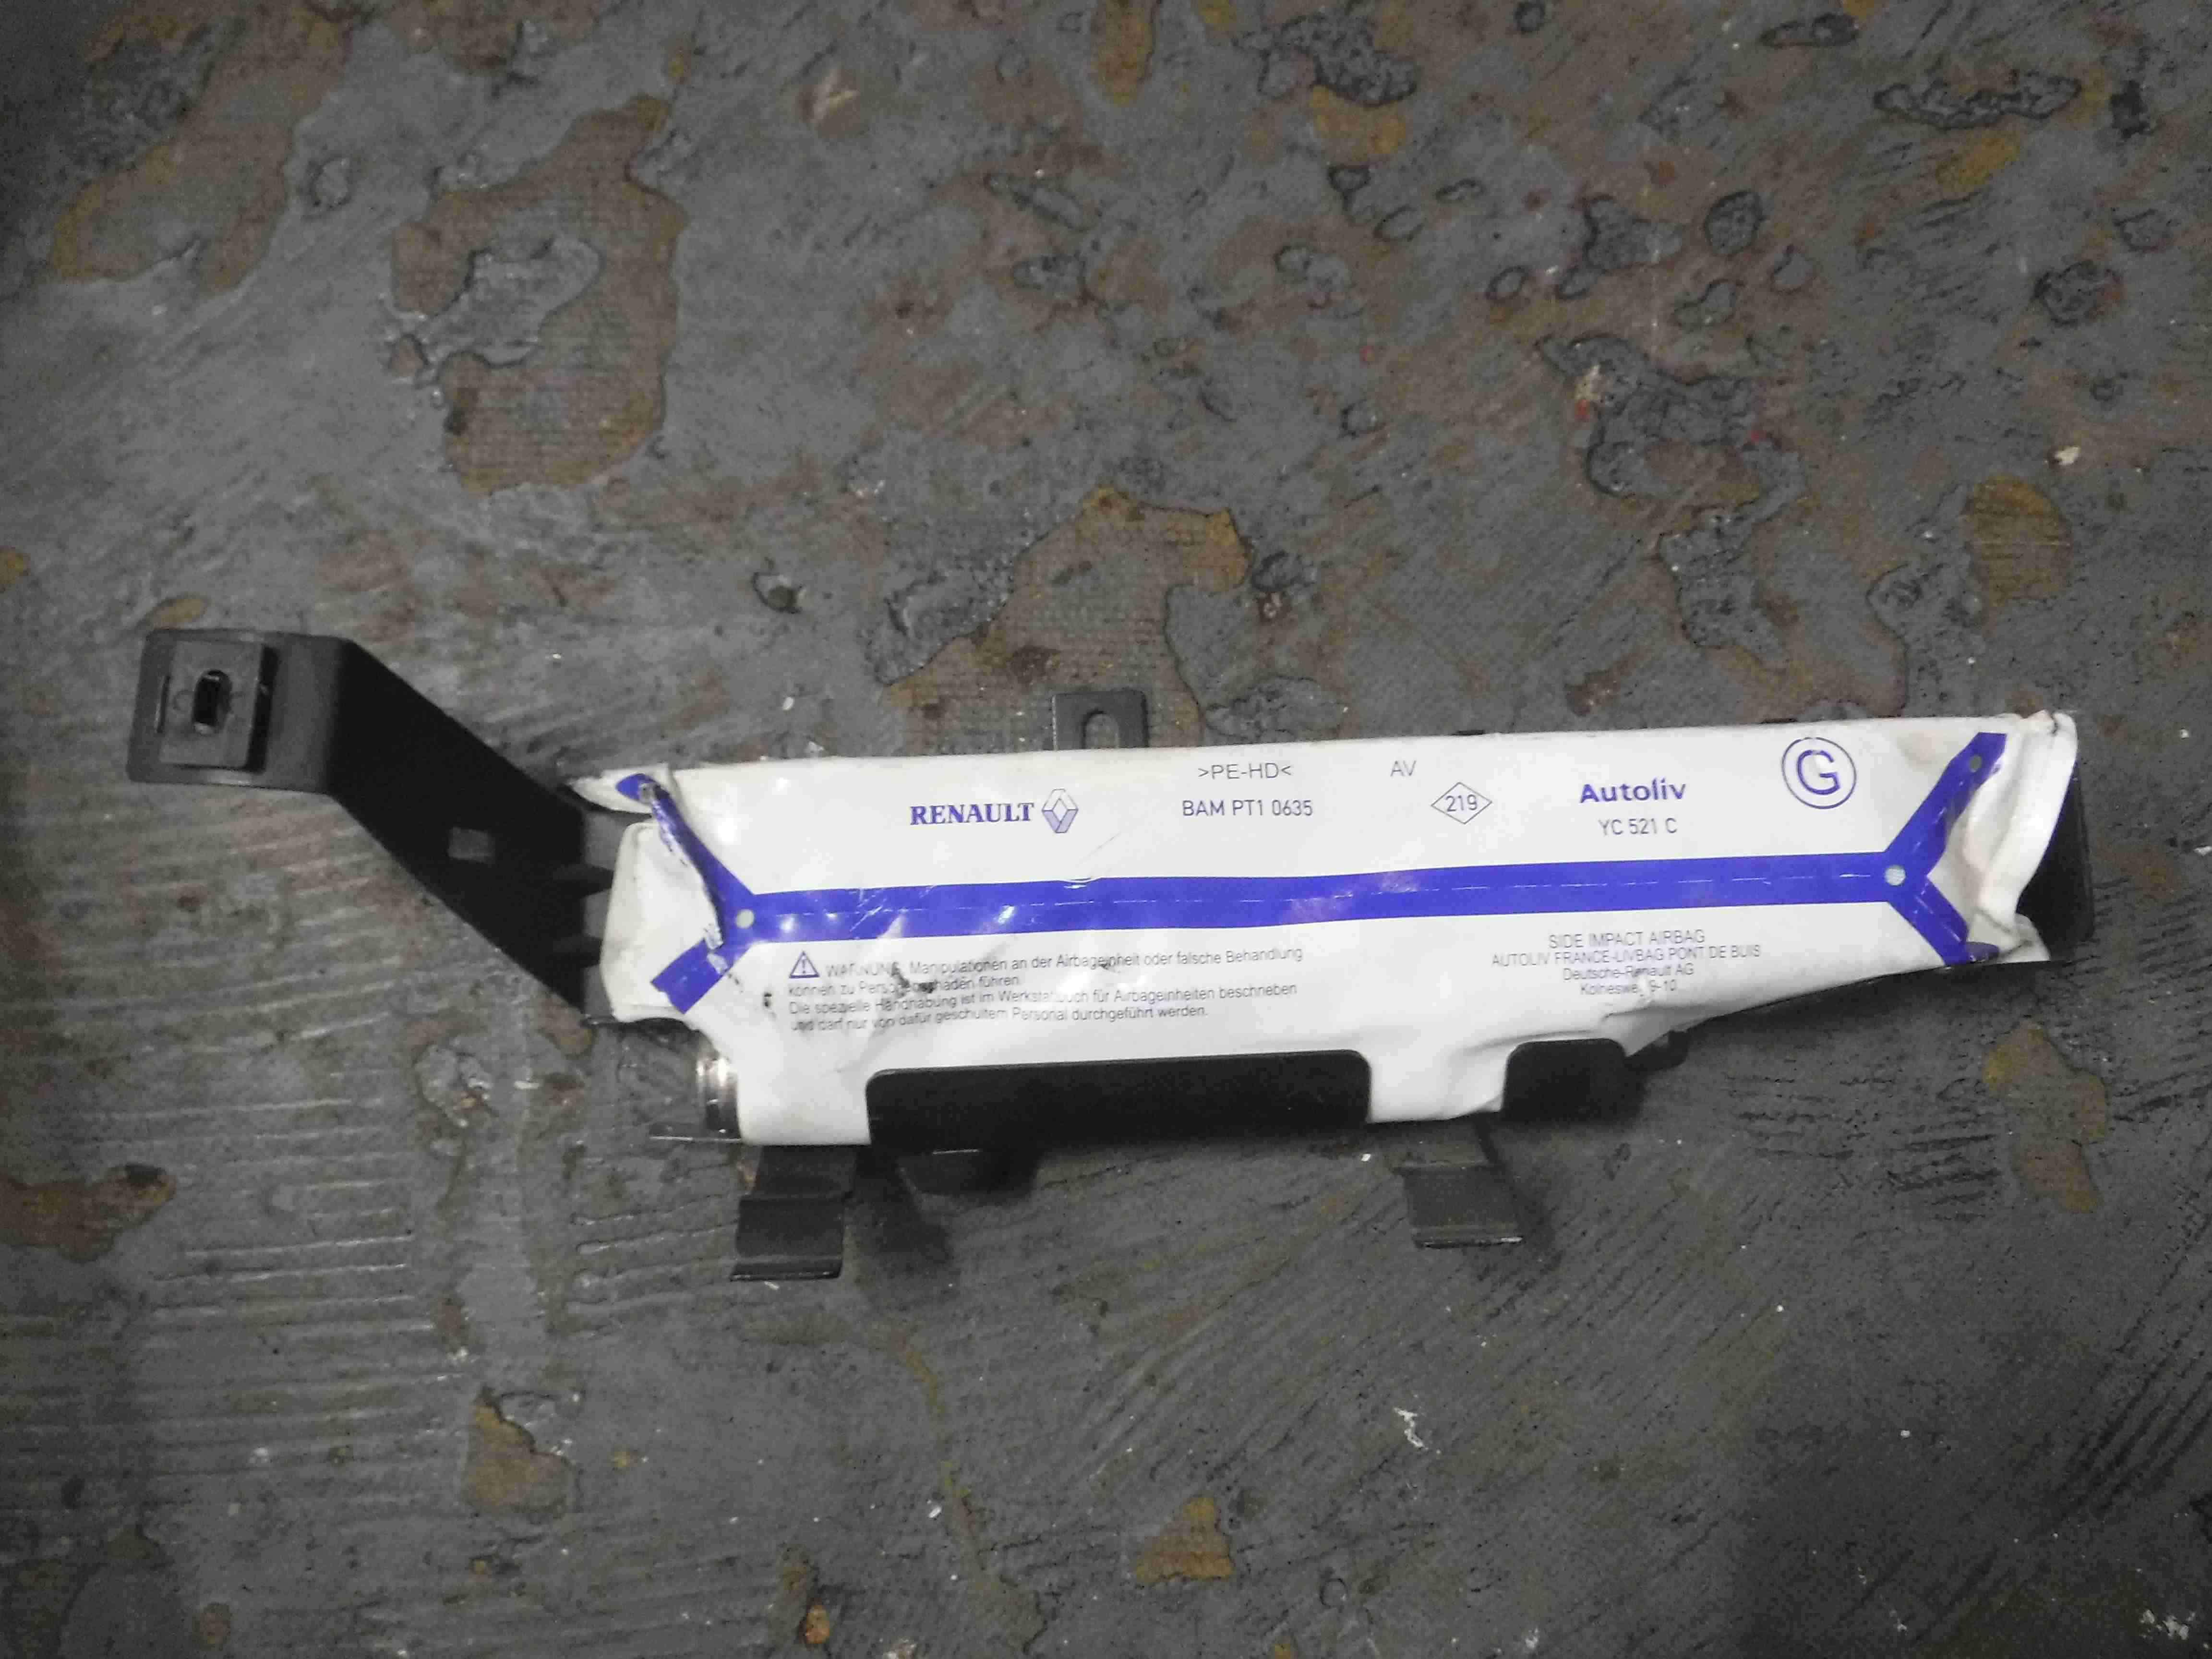 Renault Espace 2003-2013 Passenger NSR Rear Airbag 8200241448B